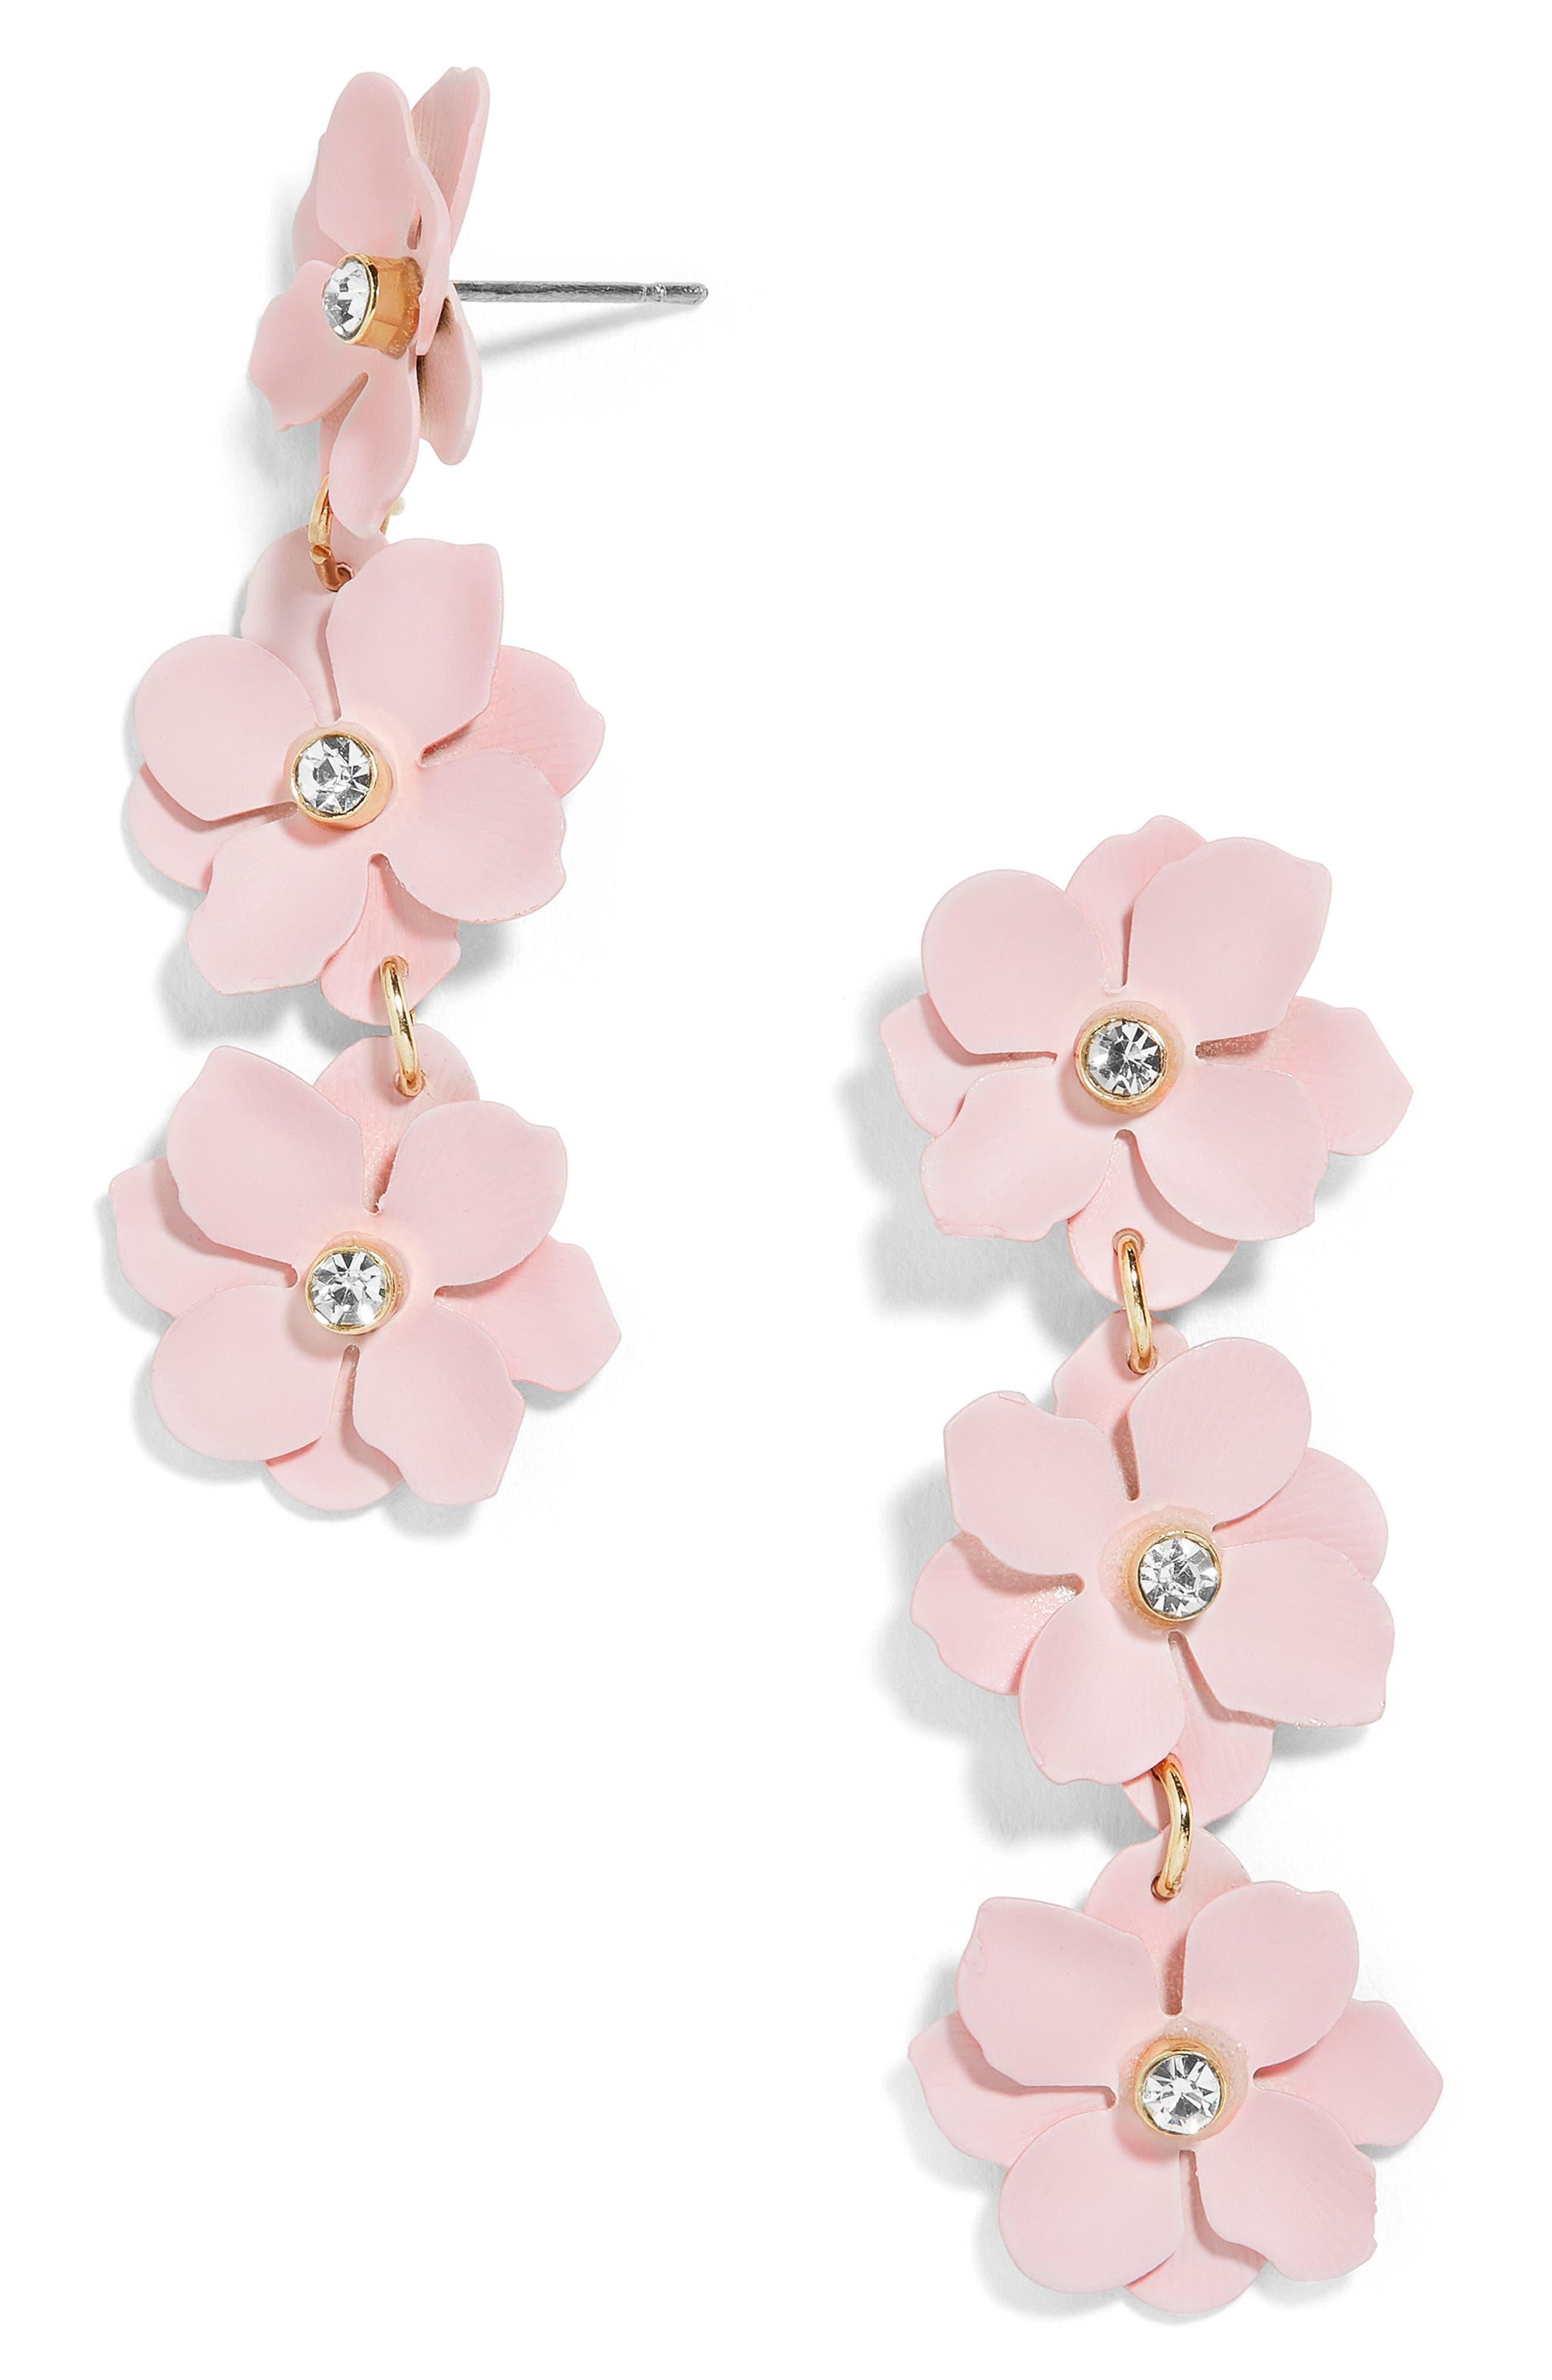 Kimi Flower Drop Earrings,                         Main,                         color, Pink